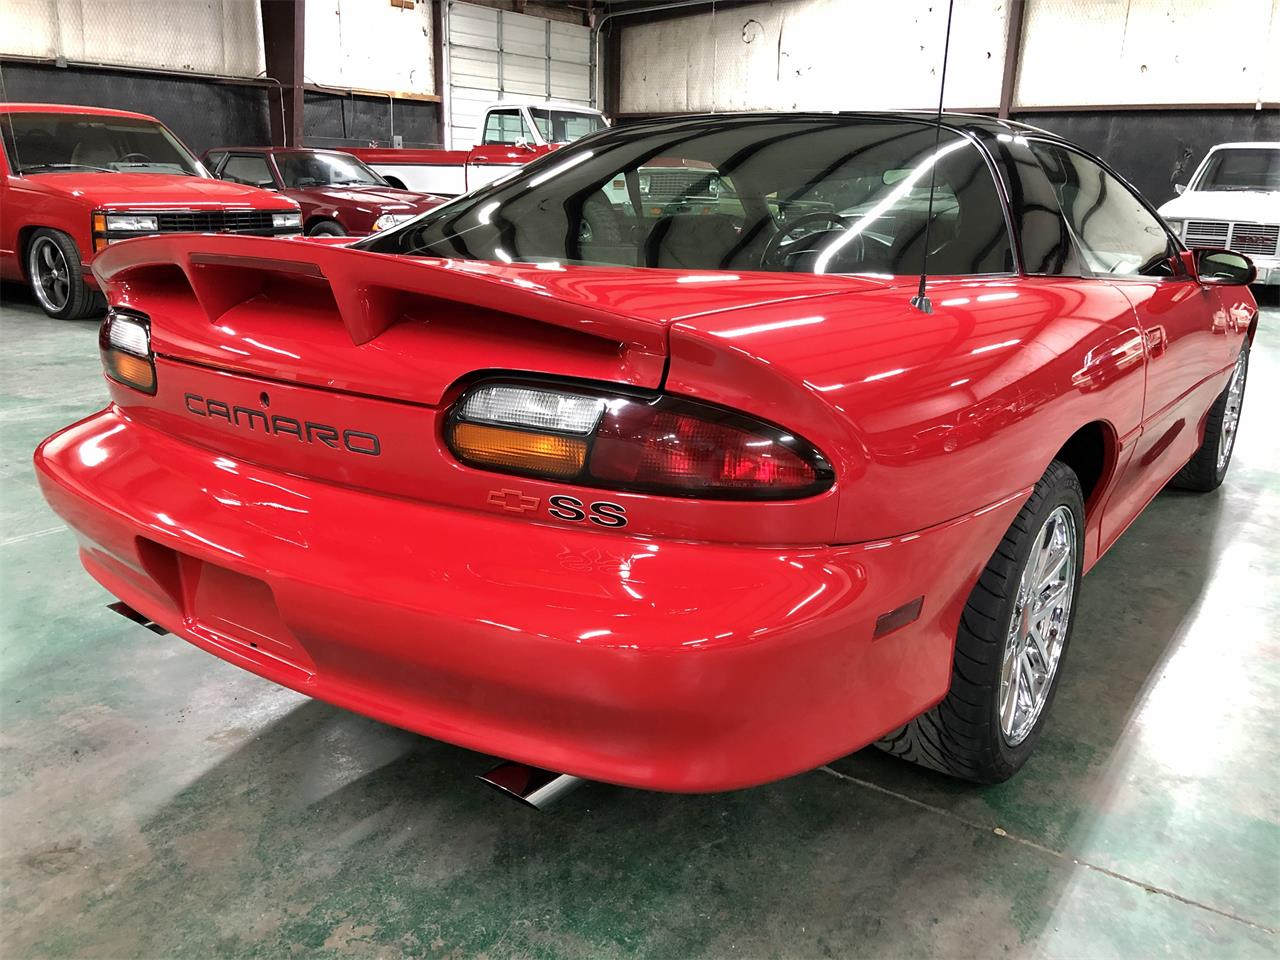 2002 Chevrolet Camaro (CC-1368665) for sale in Sherman, Texas